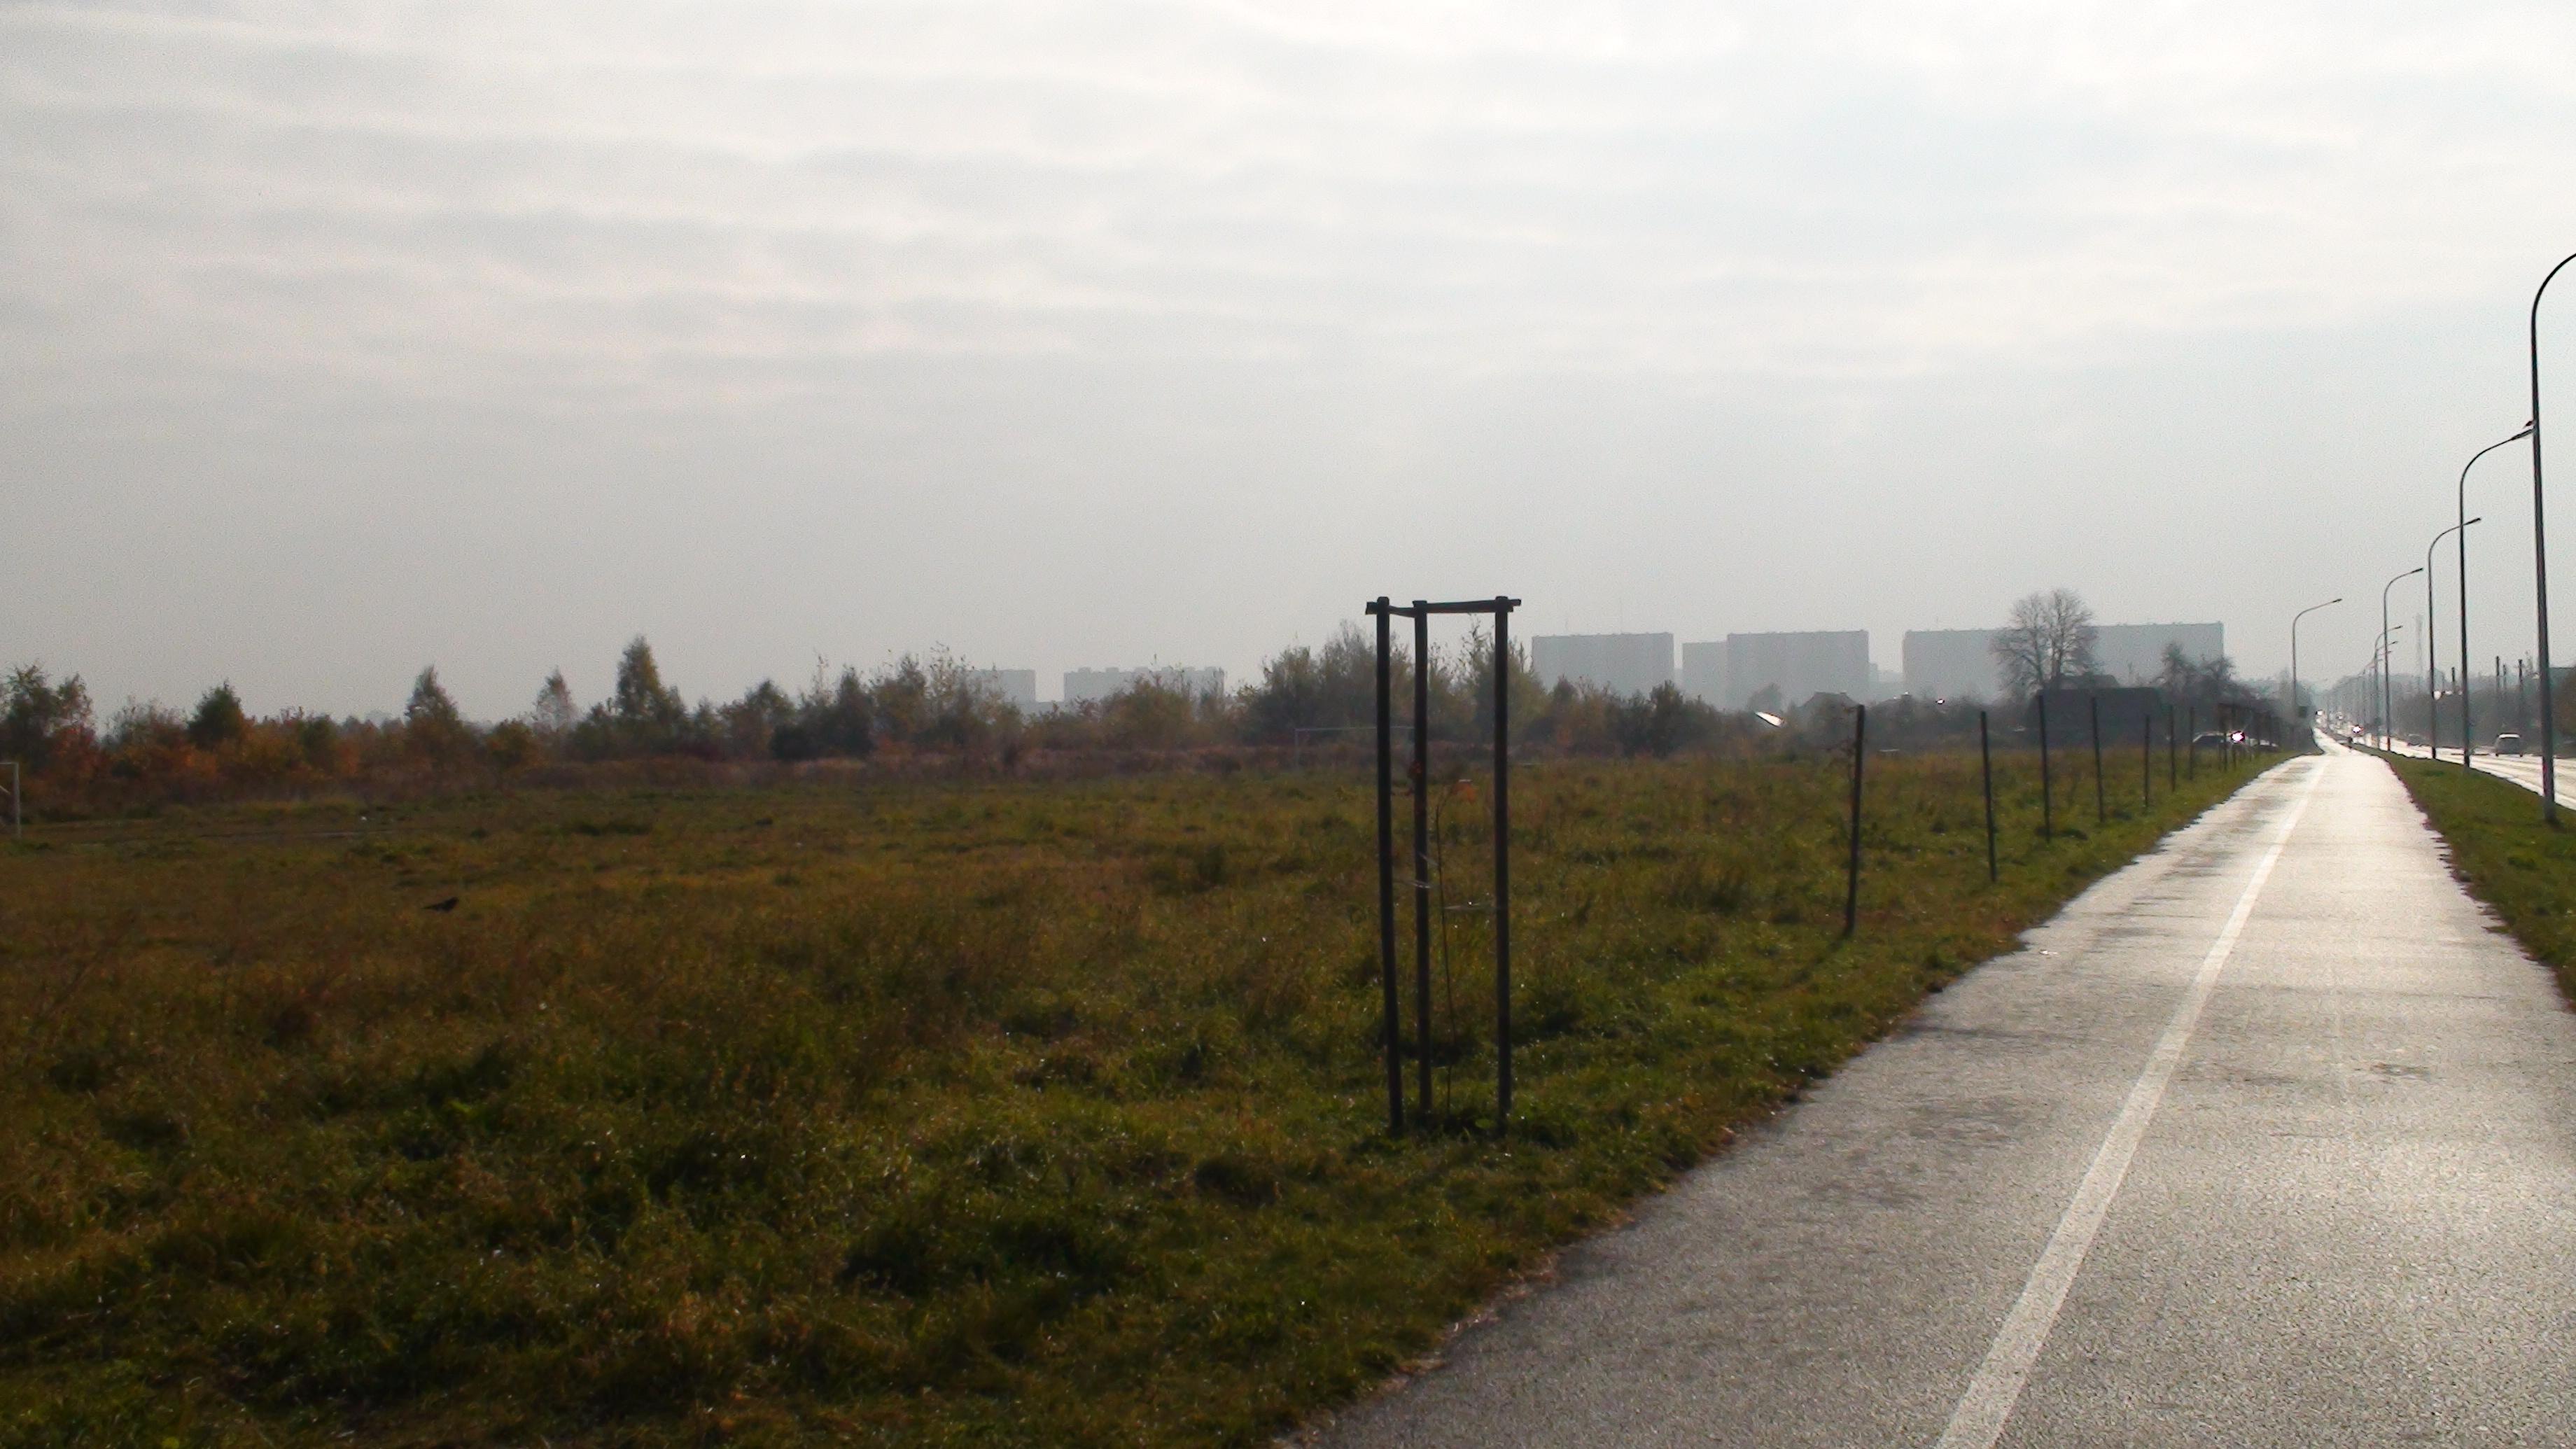 Widok na ulicę  Iłżecką.JPG